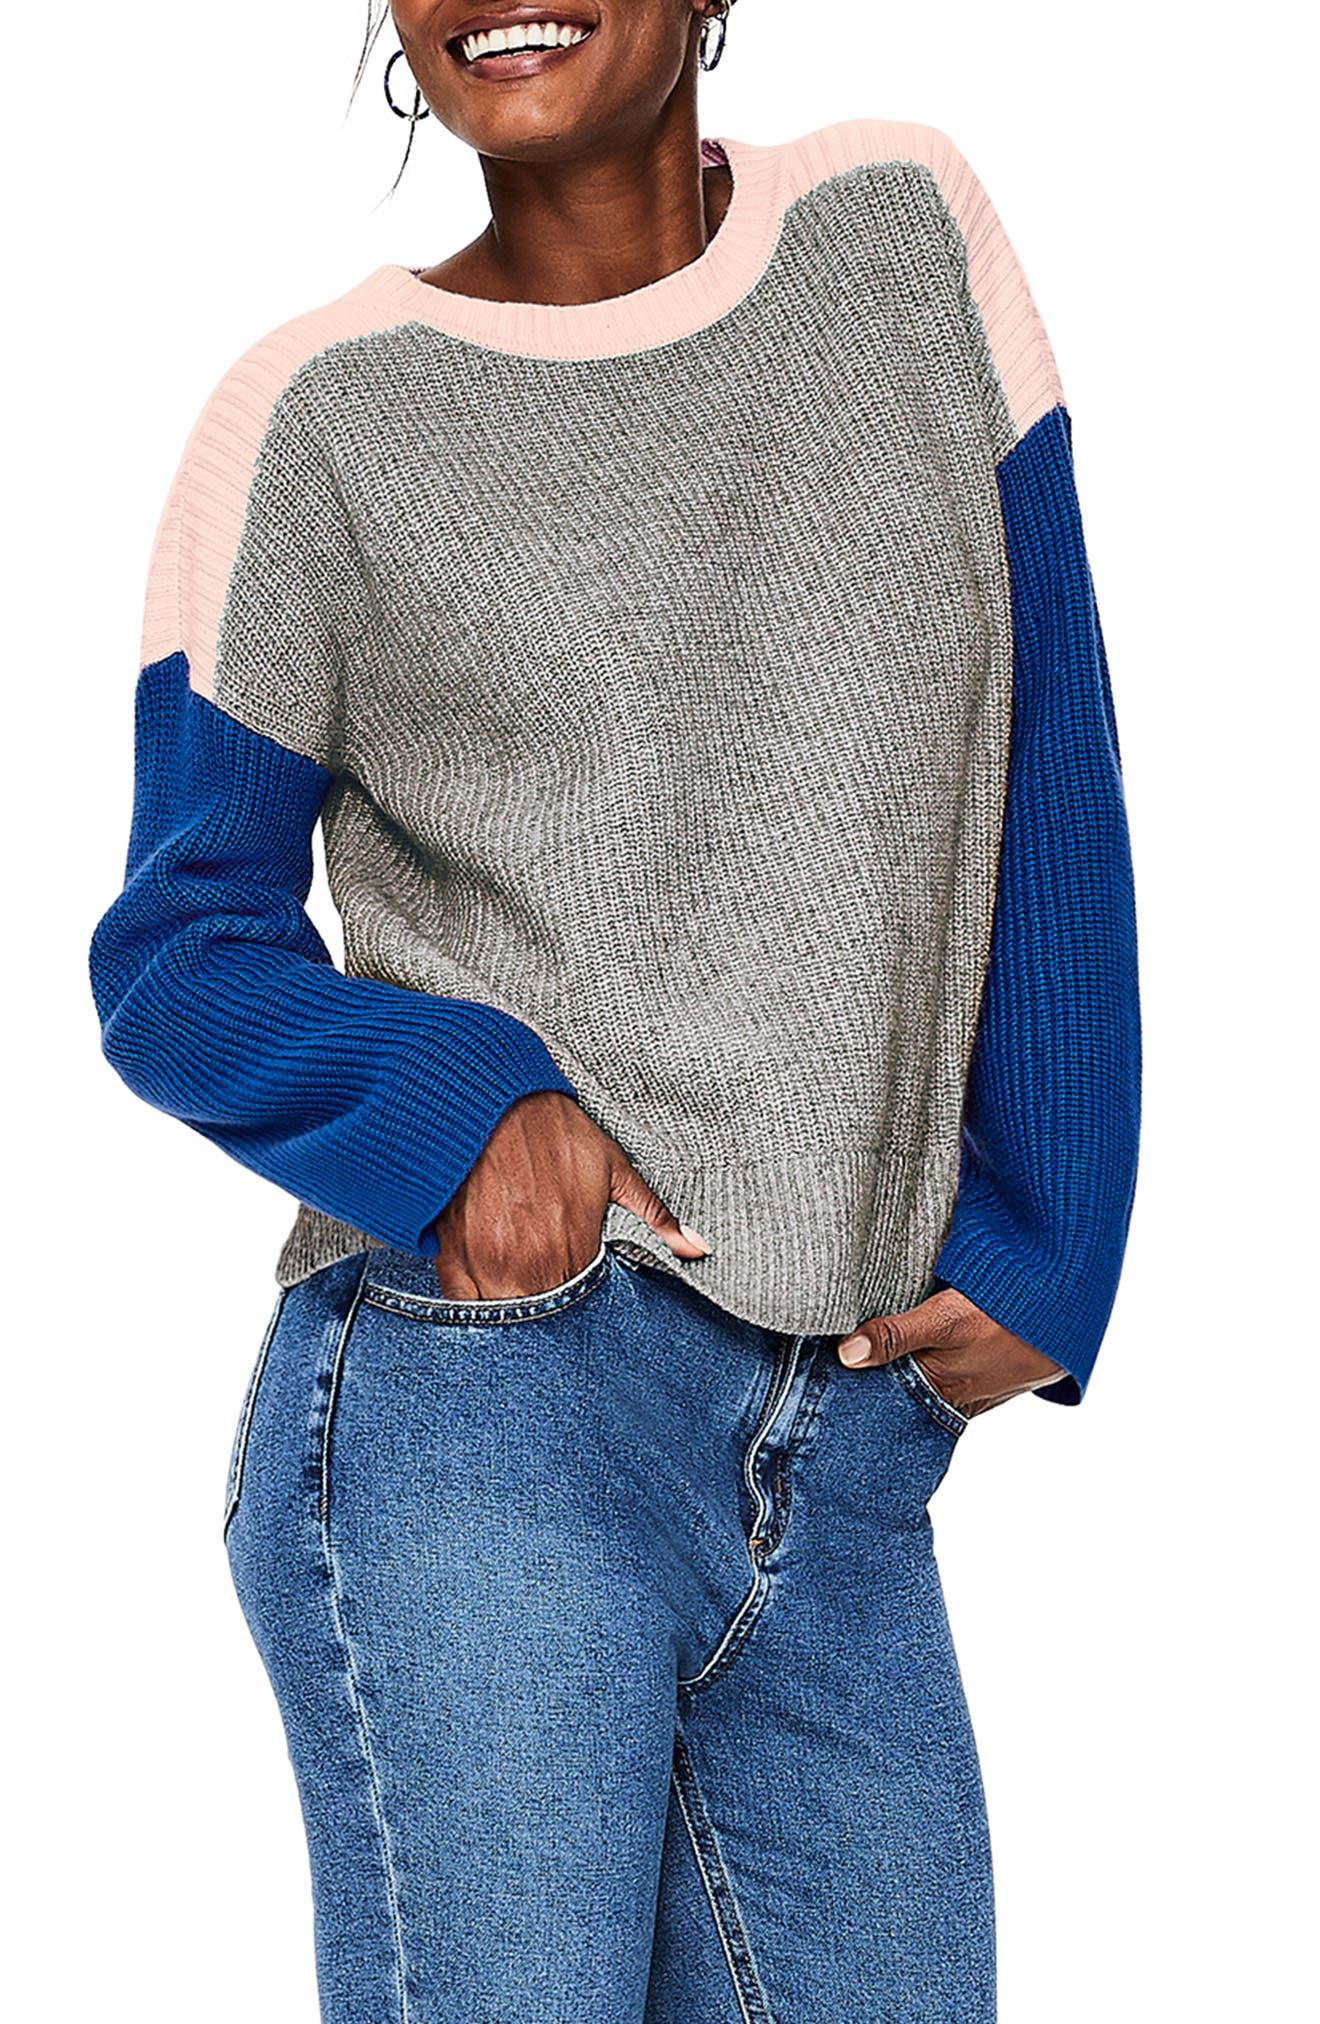 Sophie Colorblock Sweater,                             Main thumbnail 1, color,                             GREY MELANGE